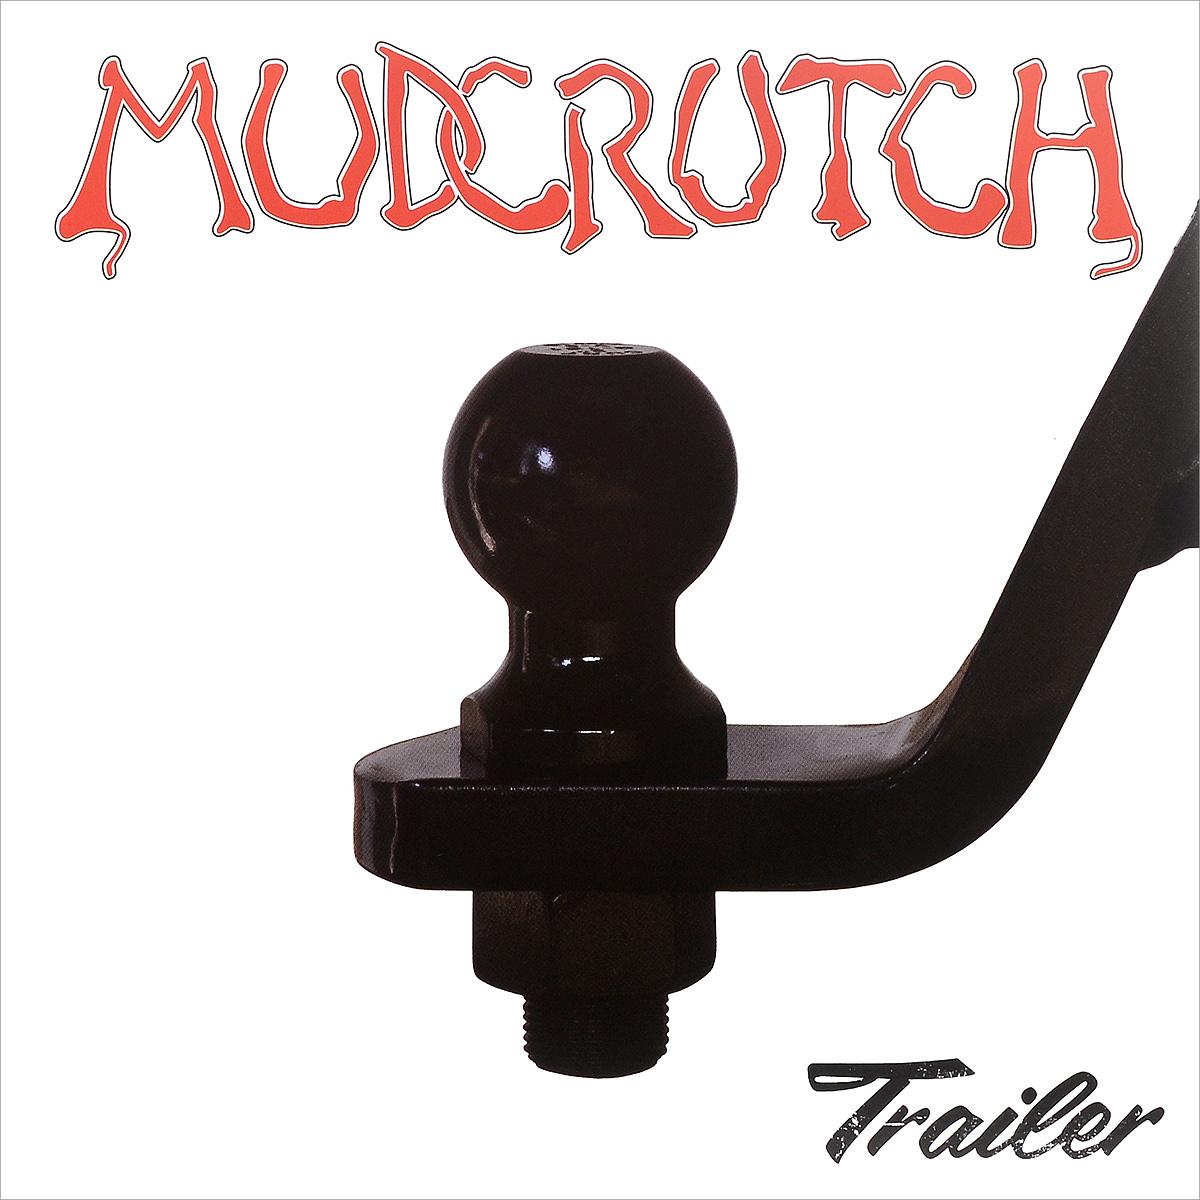 Mudcrutch Mudcrutch. Trailer (LP) decoretto art холст строчки и бабочки